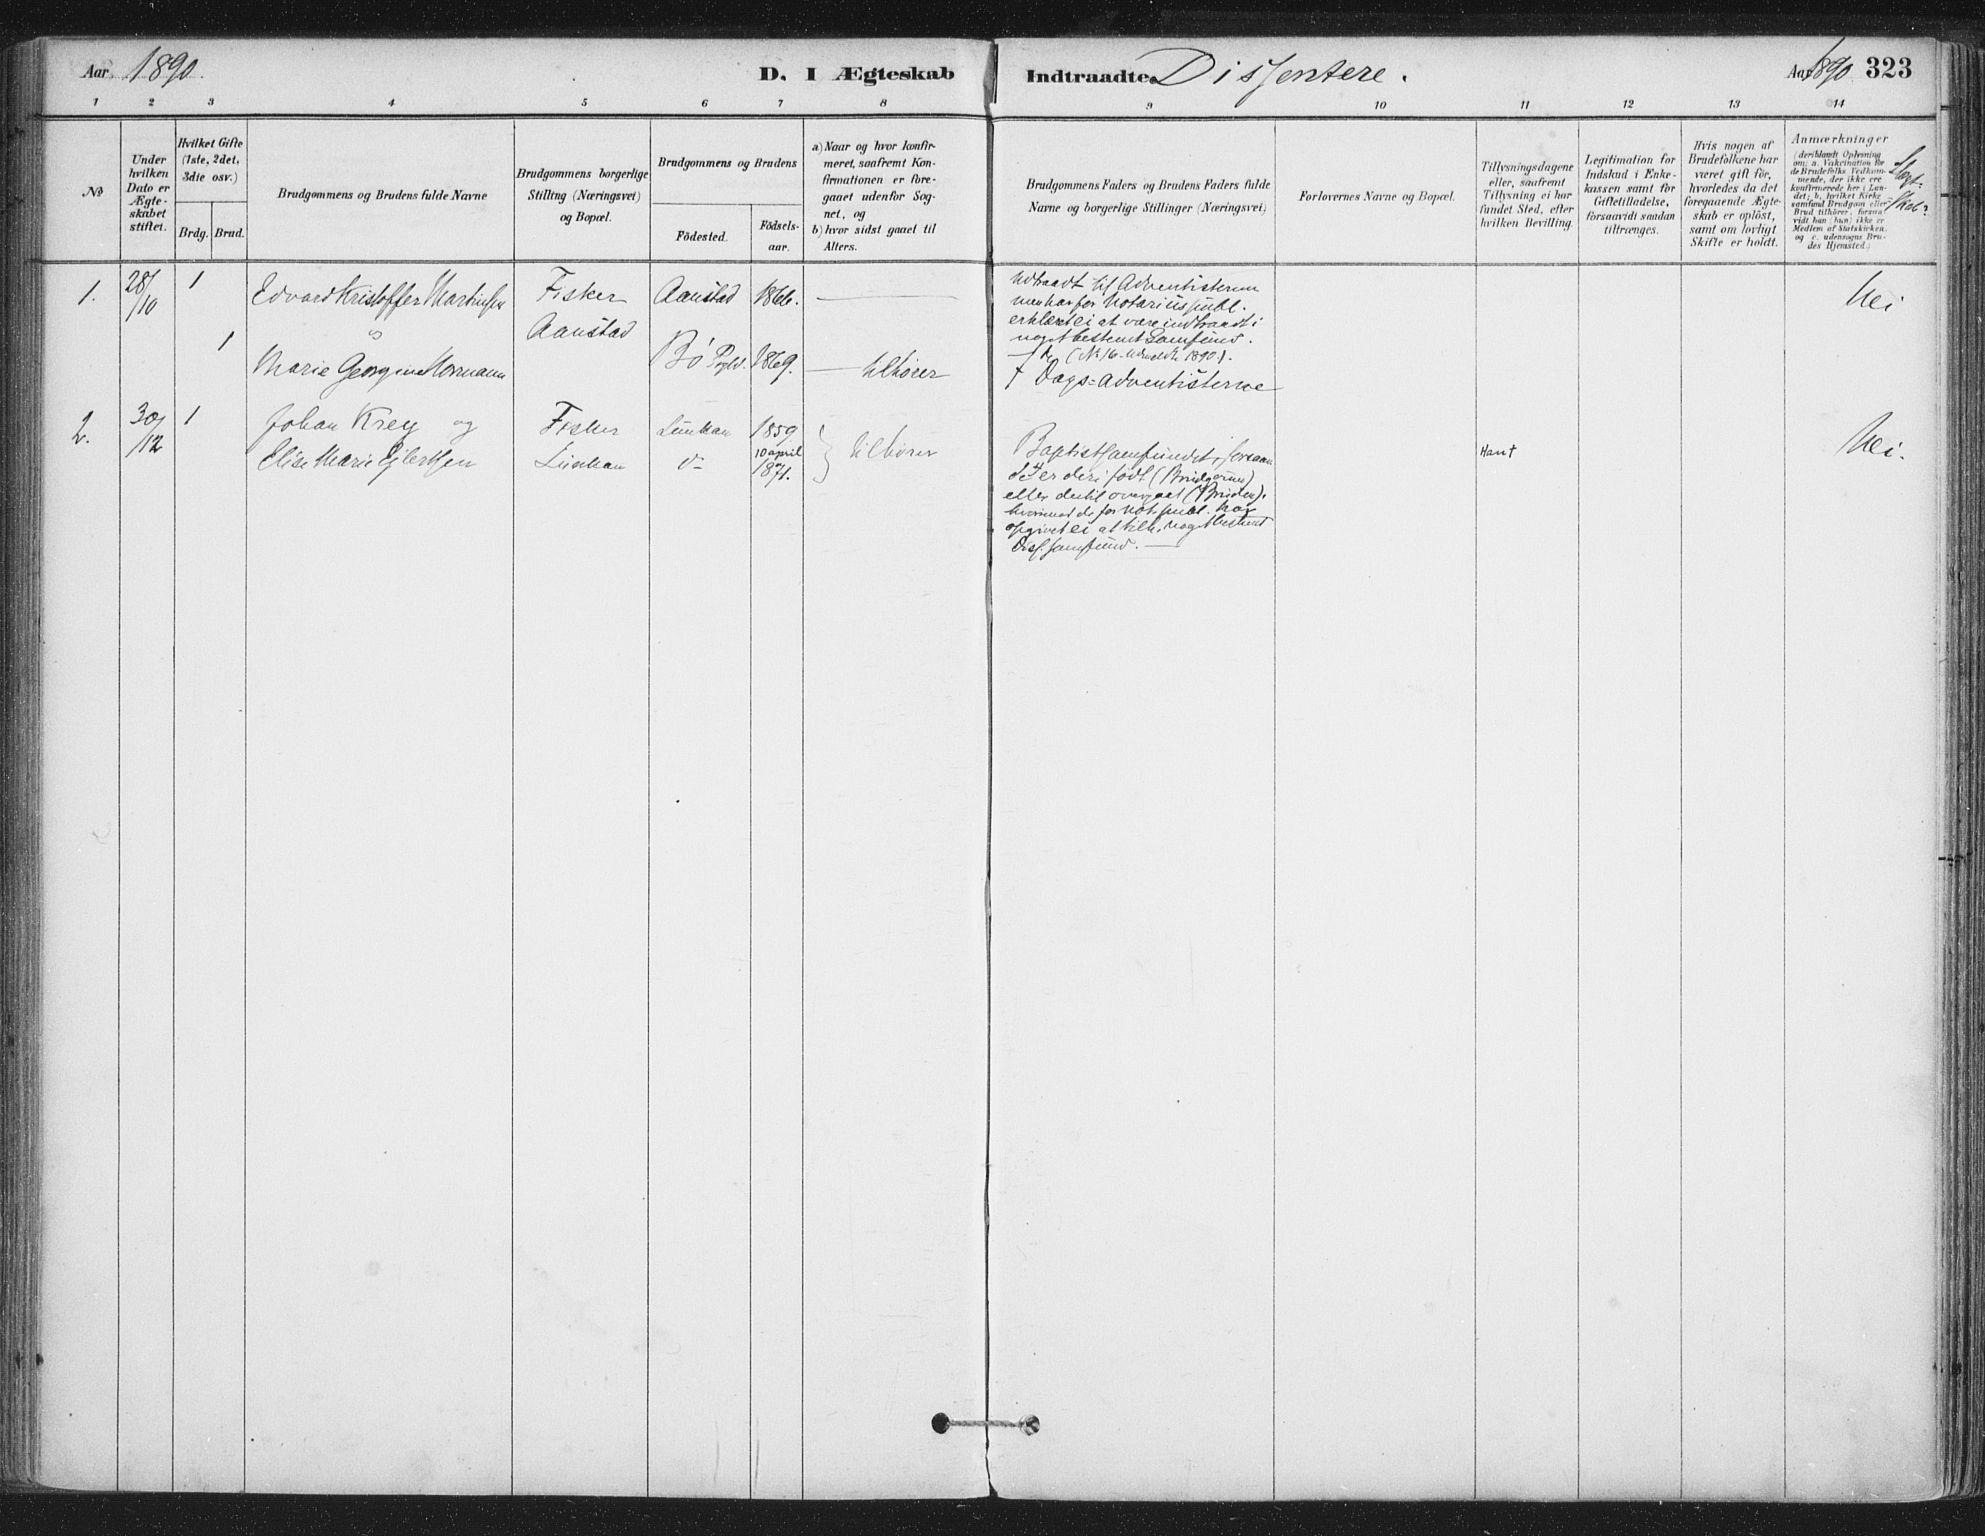 SAT, Ministerialprotokoller, klokkerbøker og fødselsregistre - Nordland, 888/L1244: Ministerialbok nr. 888A10, 1880-1890, s. 323